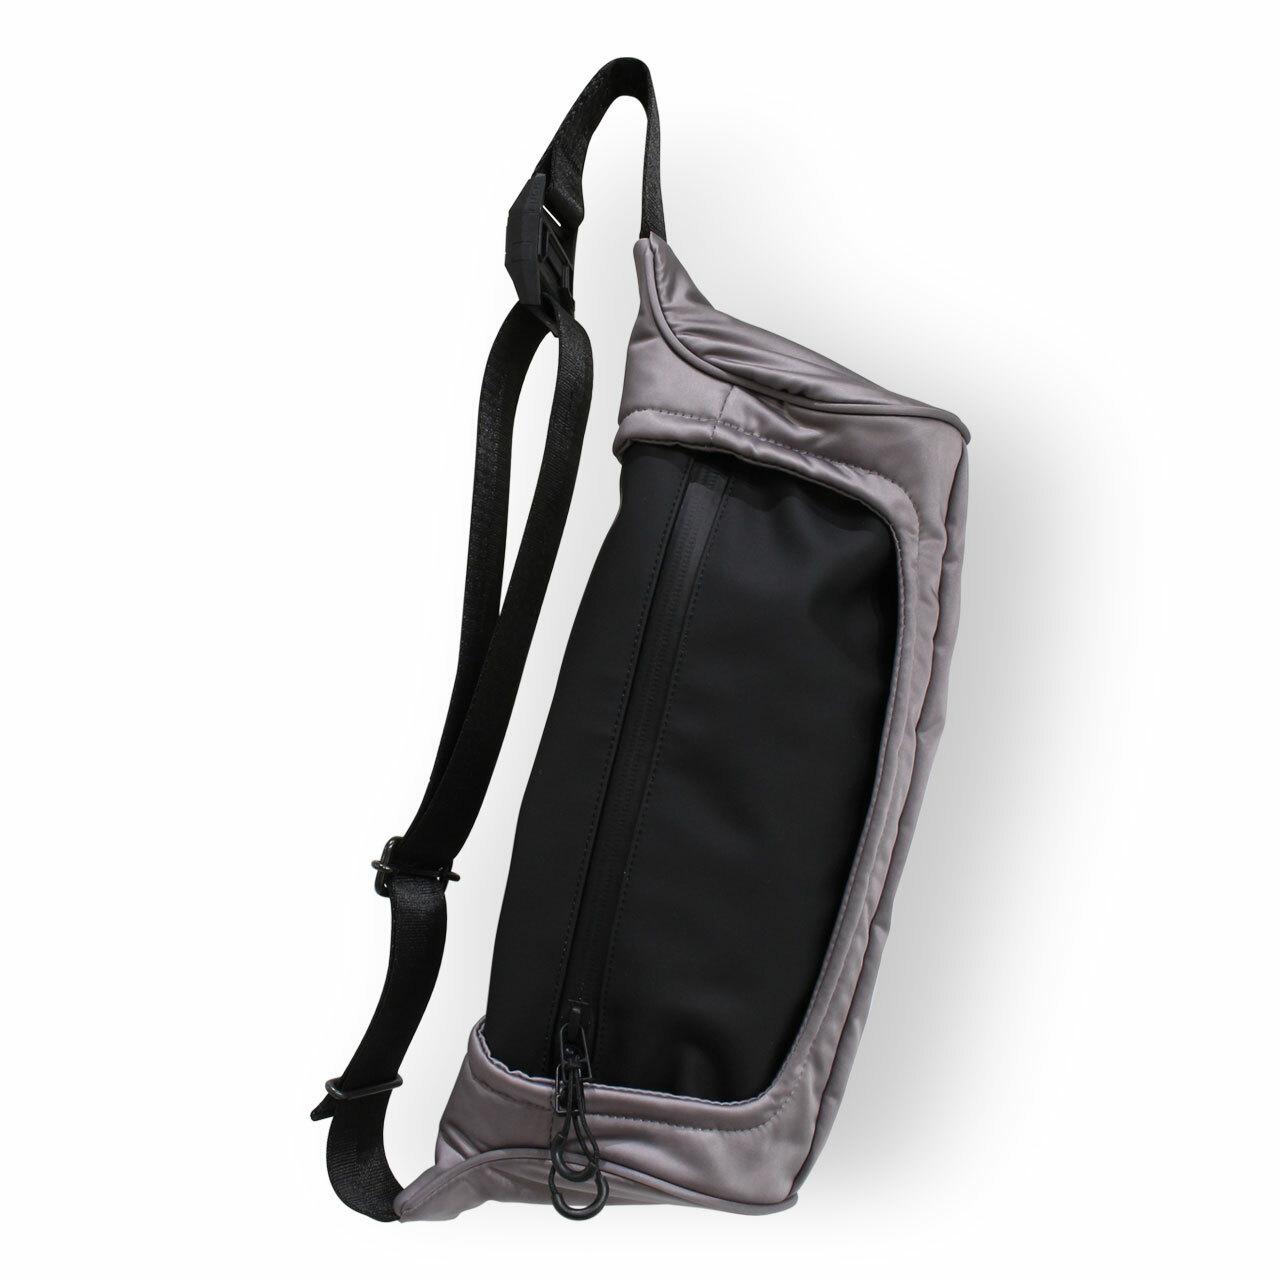 HATRA Capsule Bag CH ハトラ カプセルバッグ